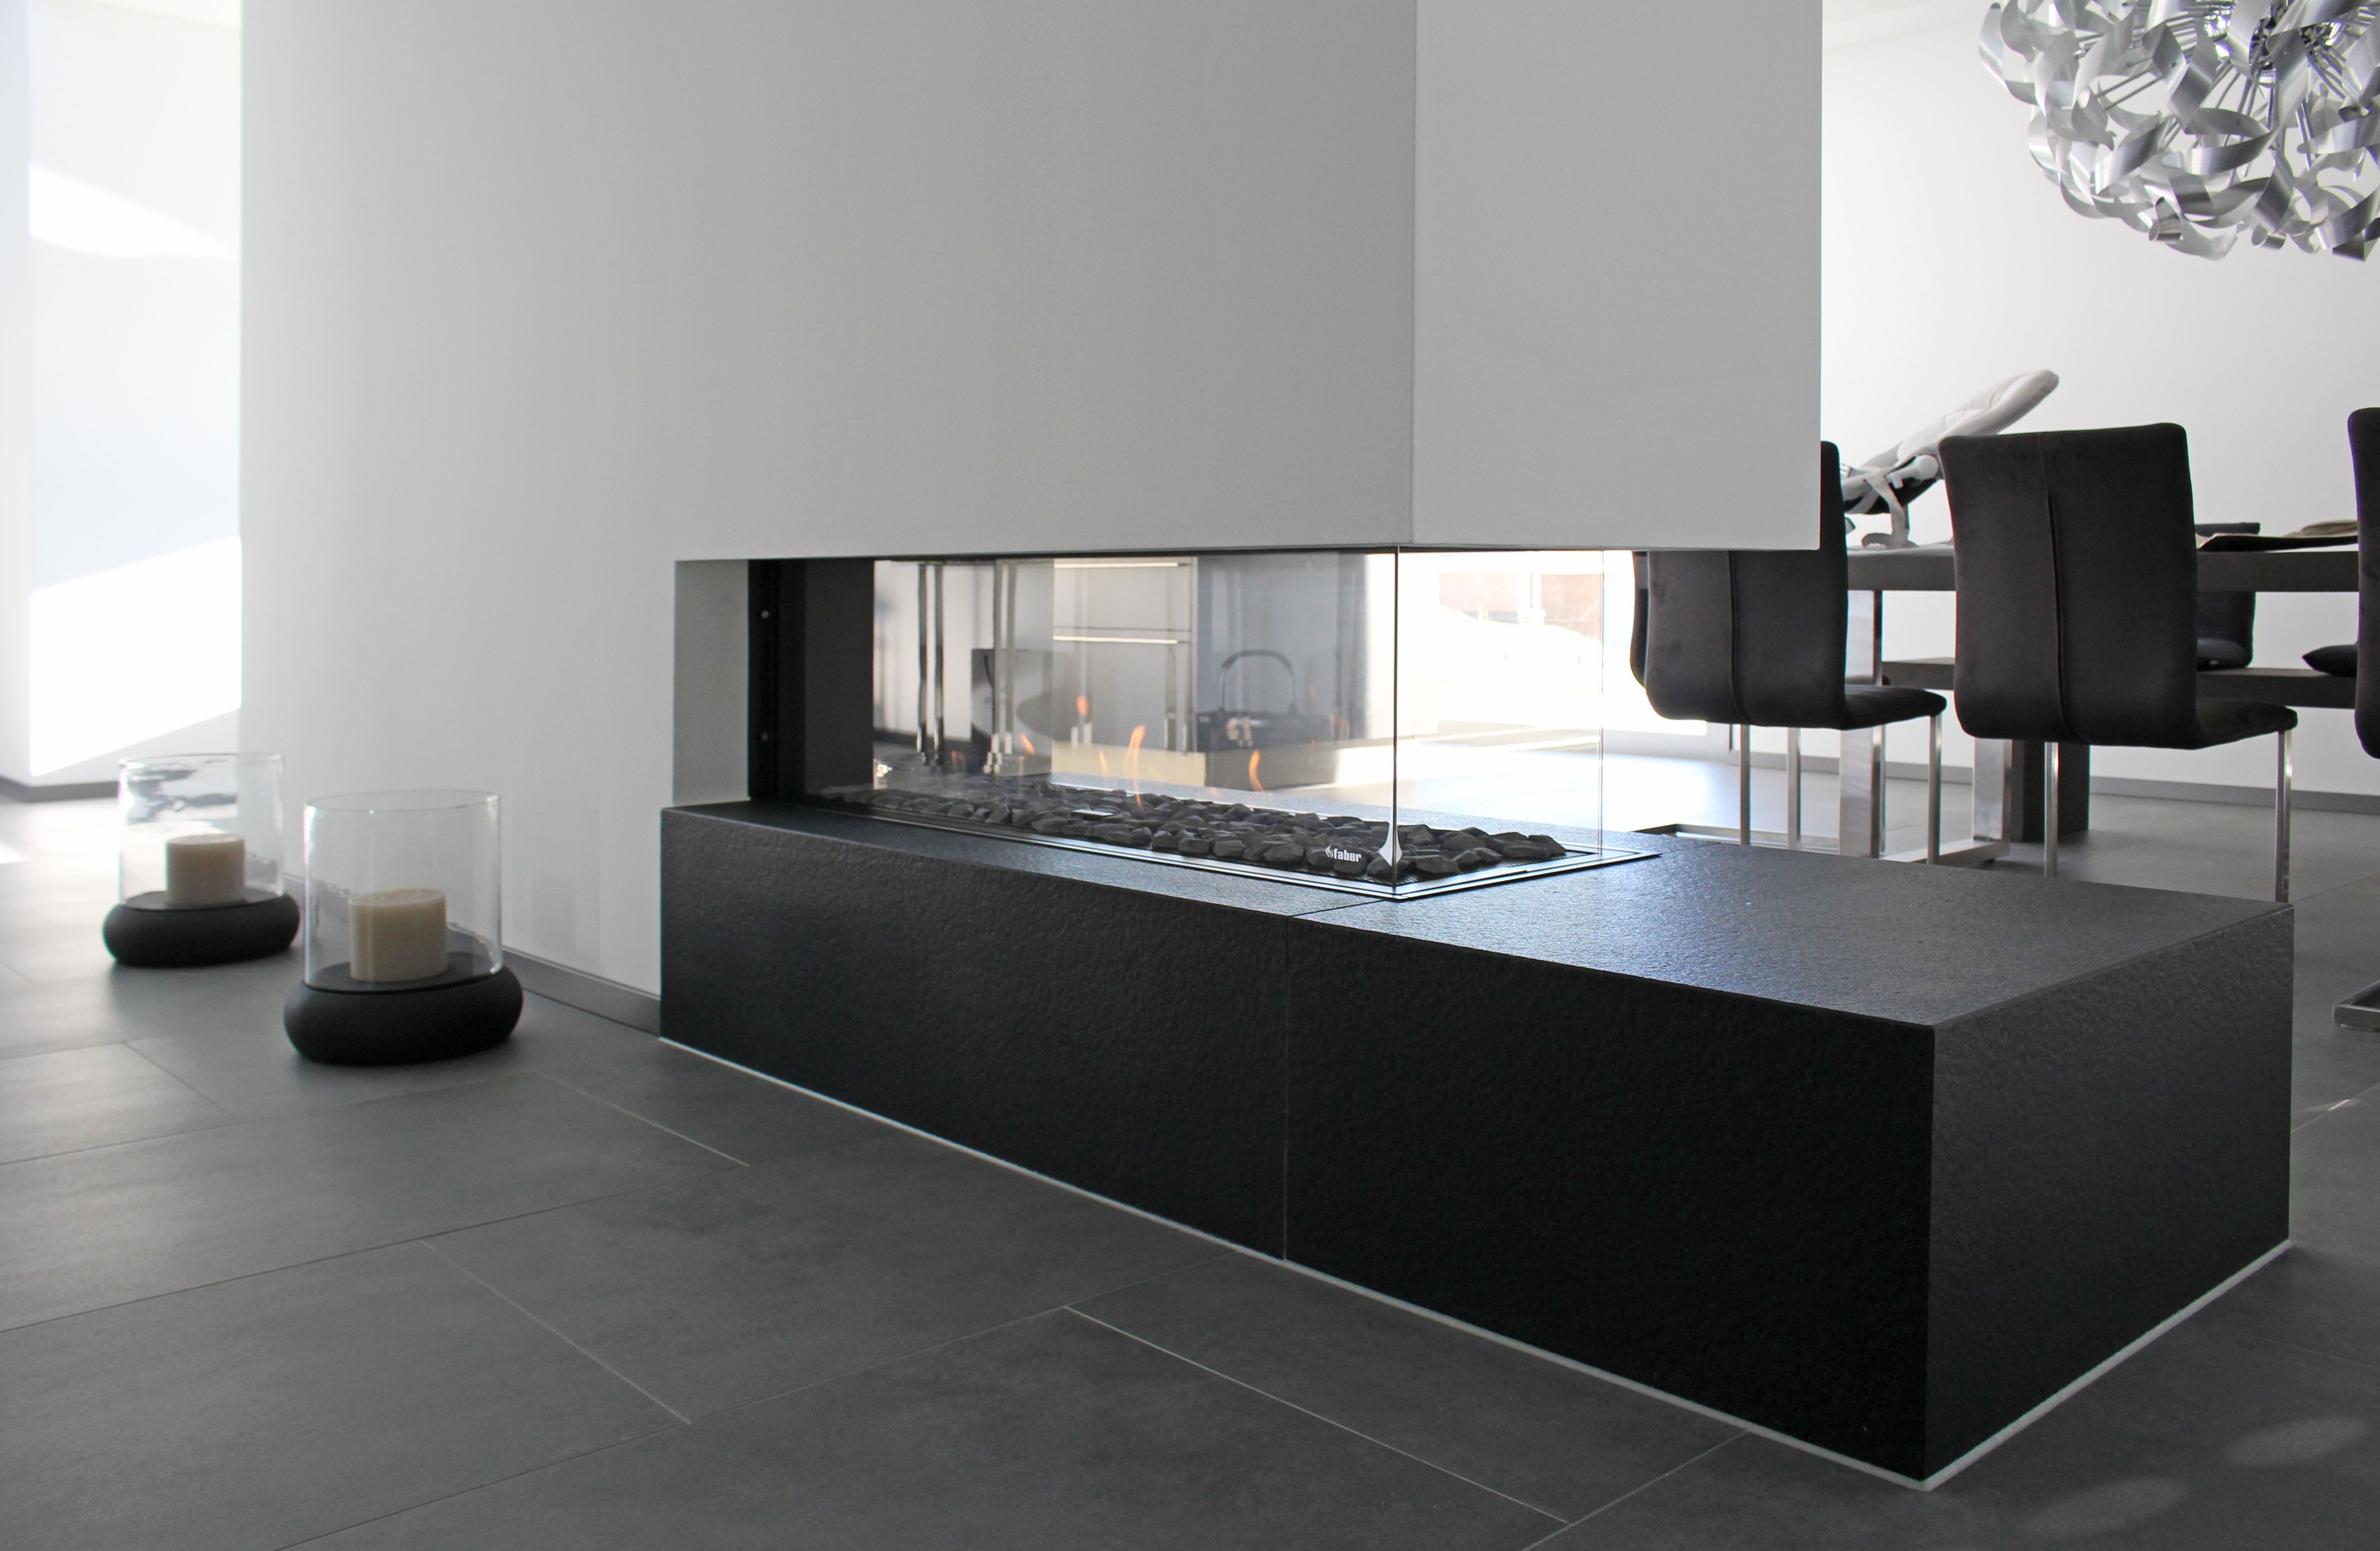 Weber Und Partner kamin design weber und partner kamine living rooms